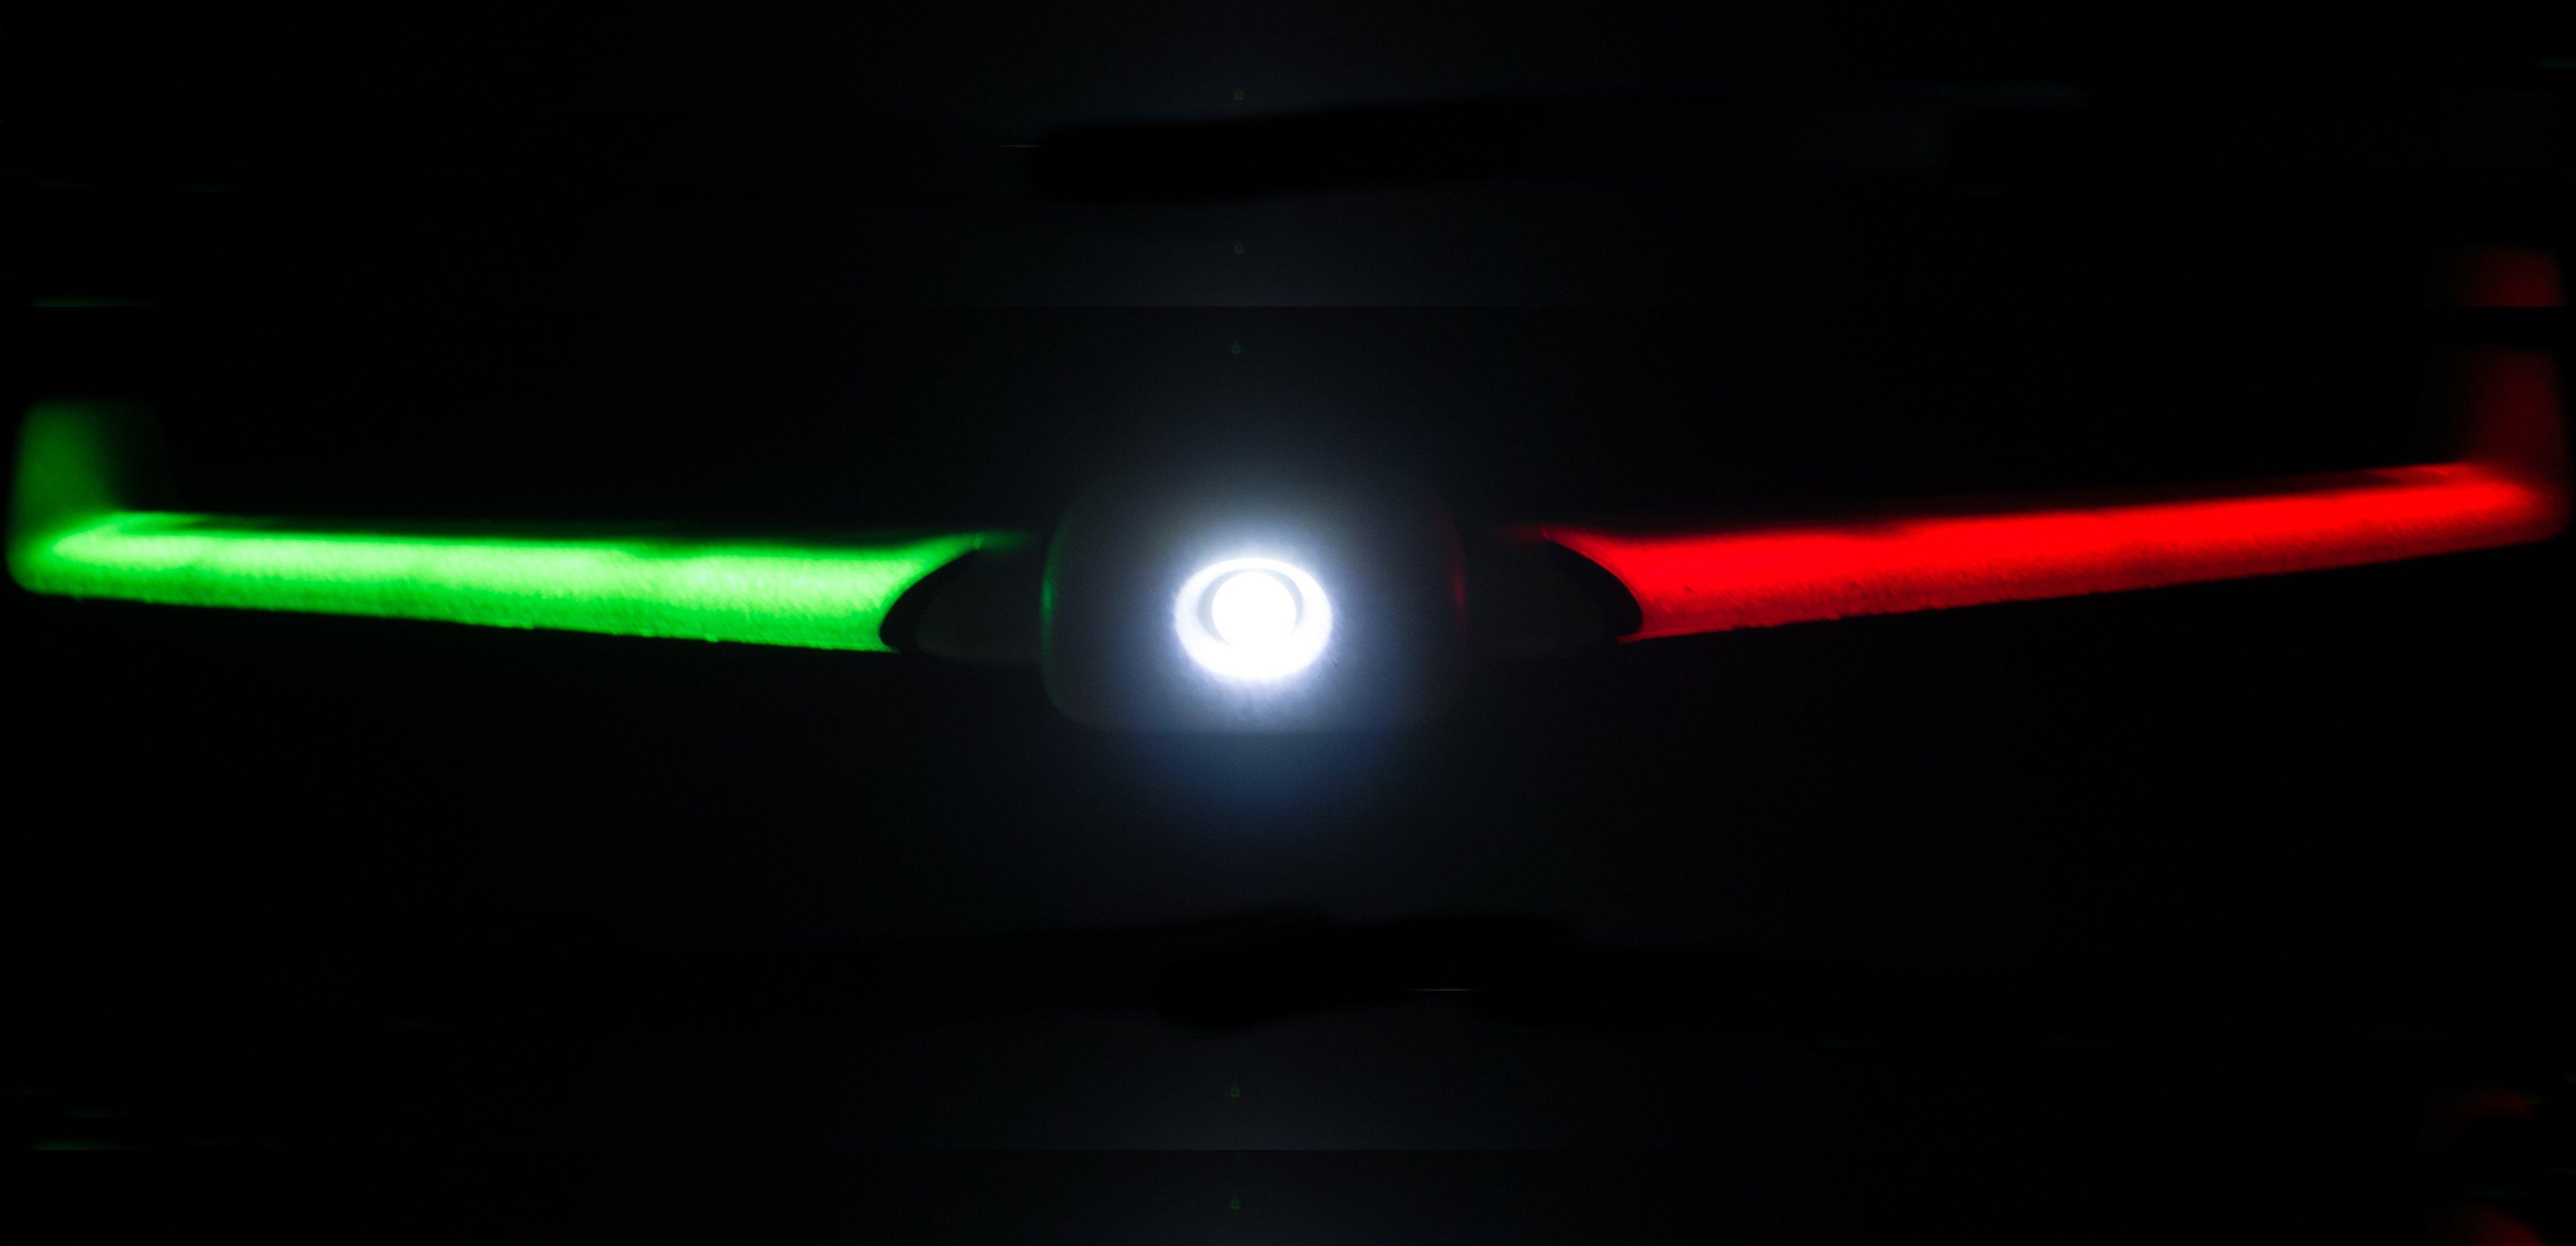 ZOHD Orbit Neon 900mm Wingspan EPP FPV Night Flying Wing RC Airplane PNP Integrated LED Light Strip